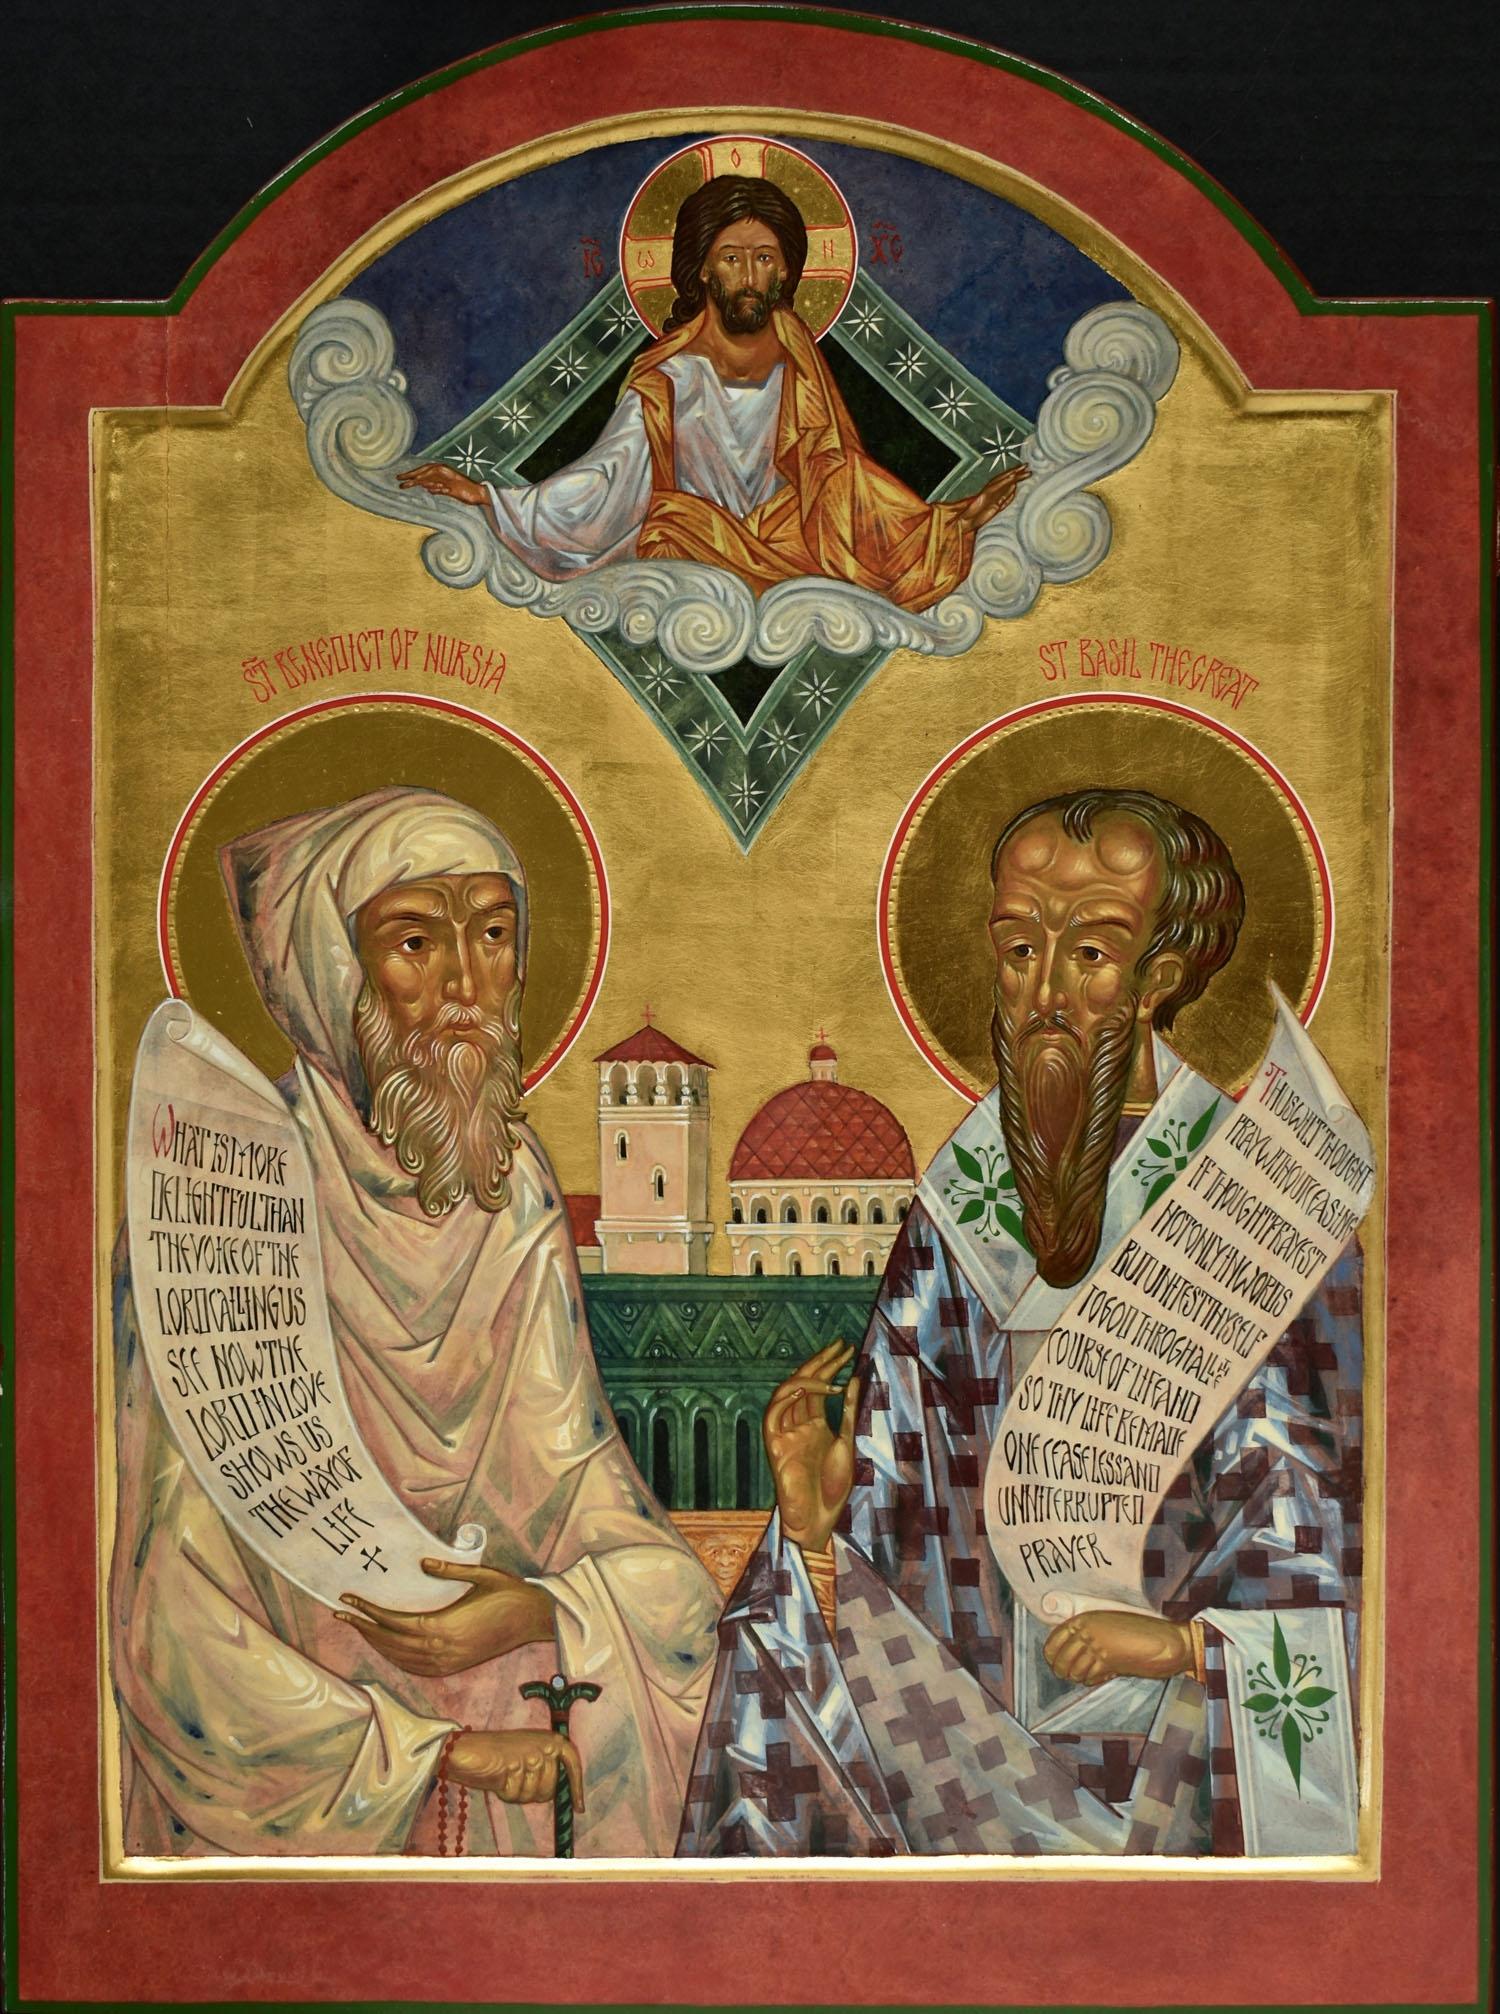 St Benedict of Nursa & St Basil the Theologian